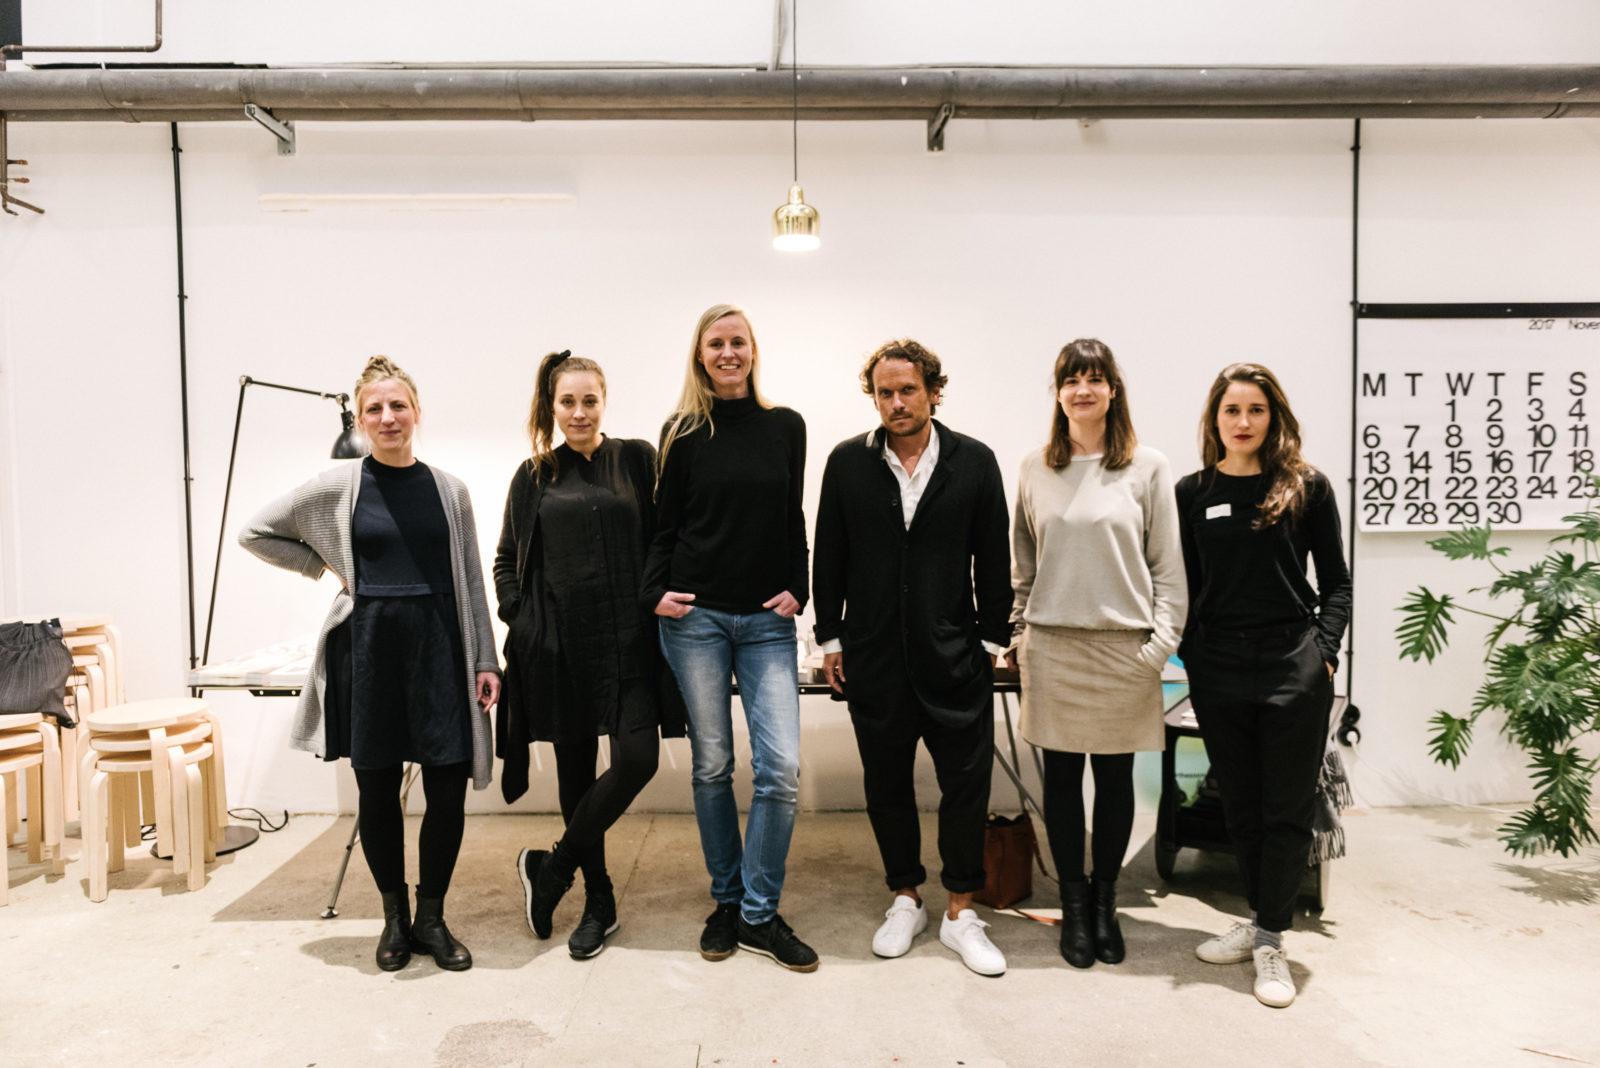 (EN) Lea Korzeczek, Anna Schunck, Florentine-Amelie Rost, Oke Hauser, Corinna Natter, Caroline Kurze